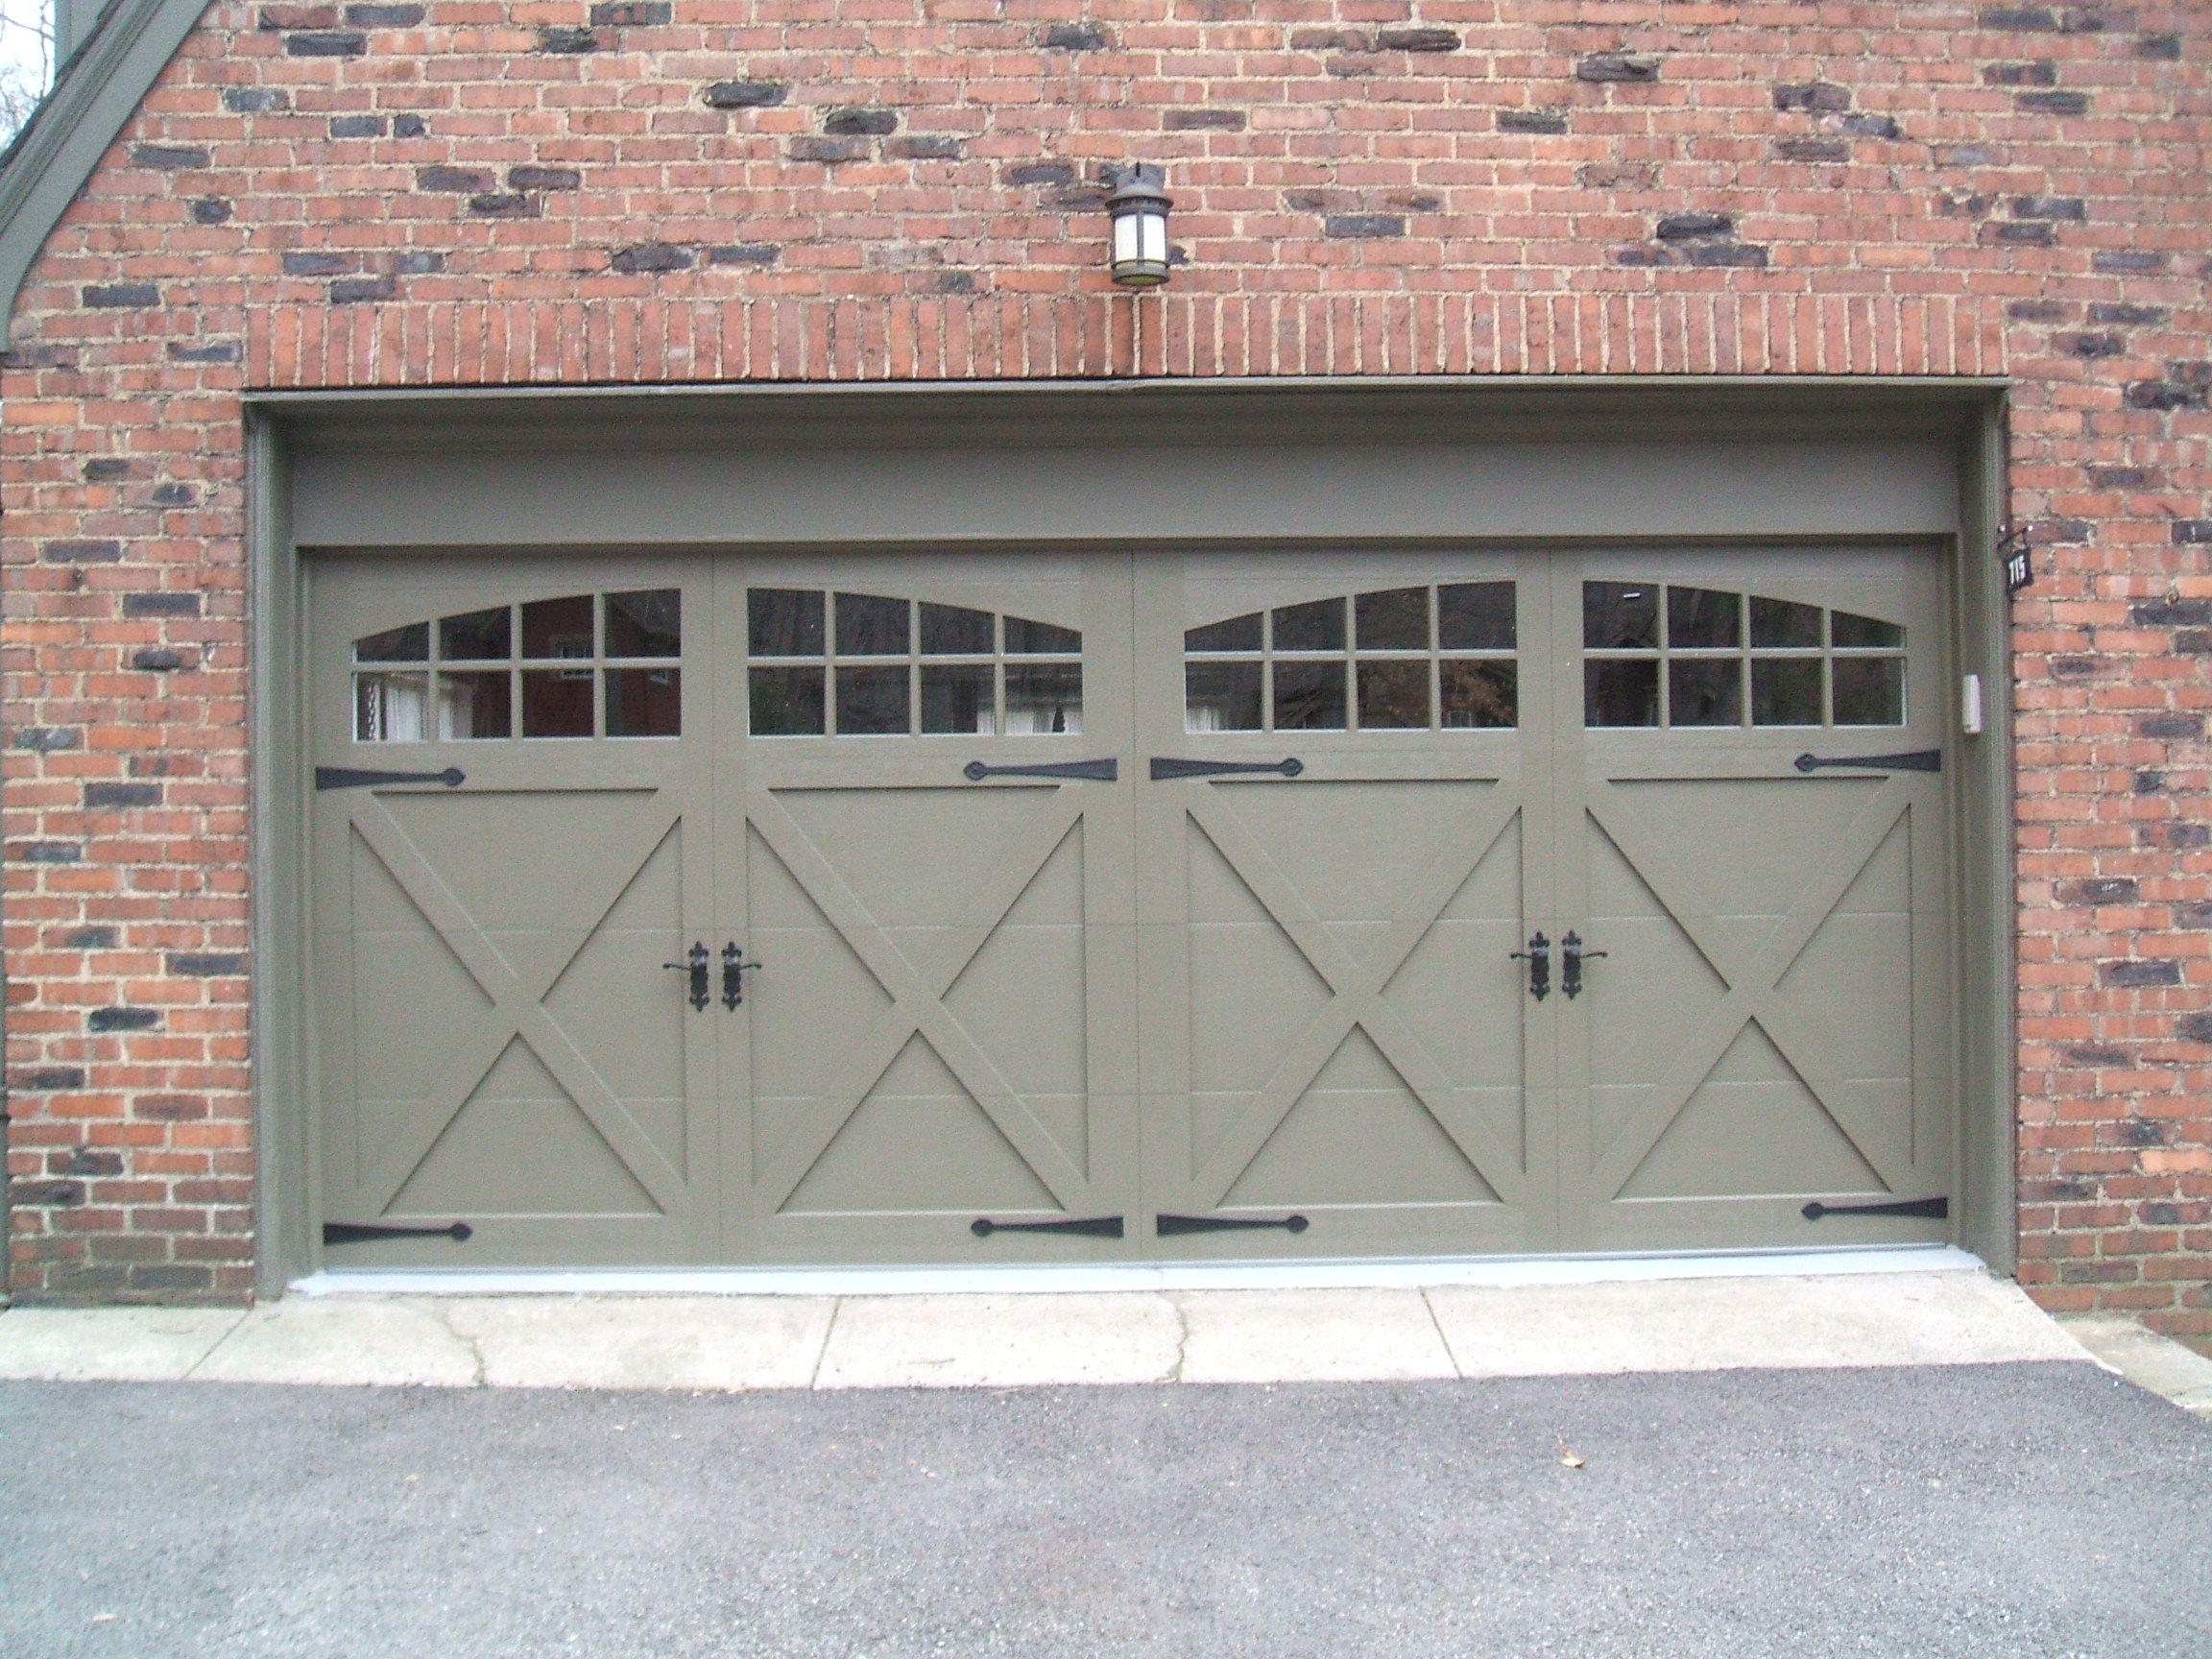 Chi Garage Door Series 5534 Installed By Thomas V Giel Garage